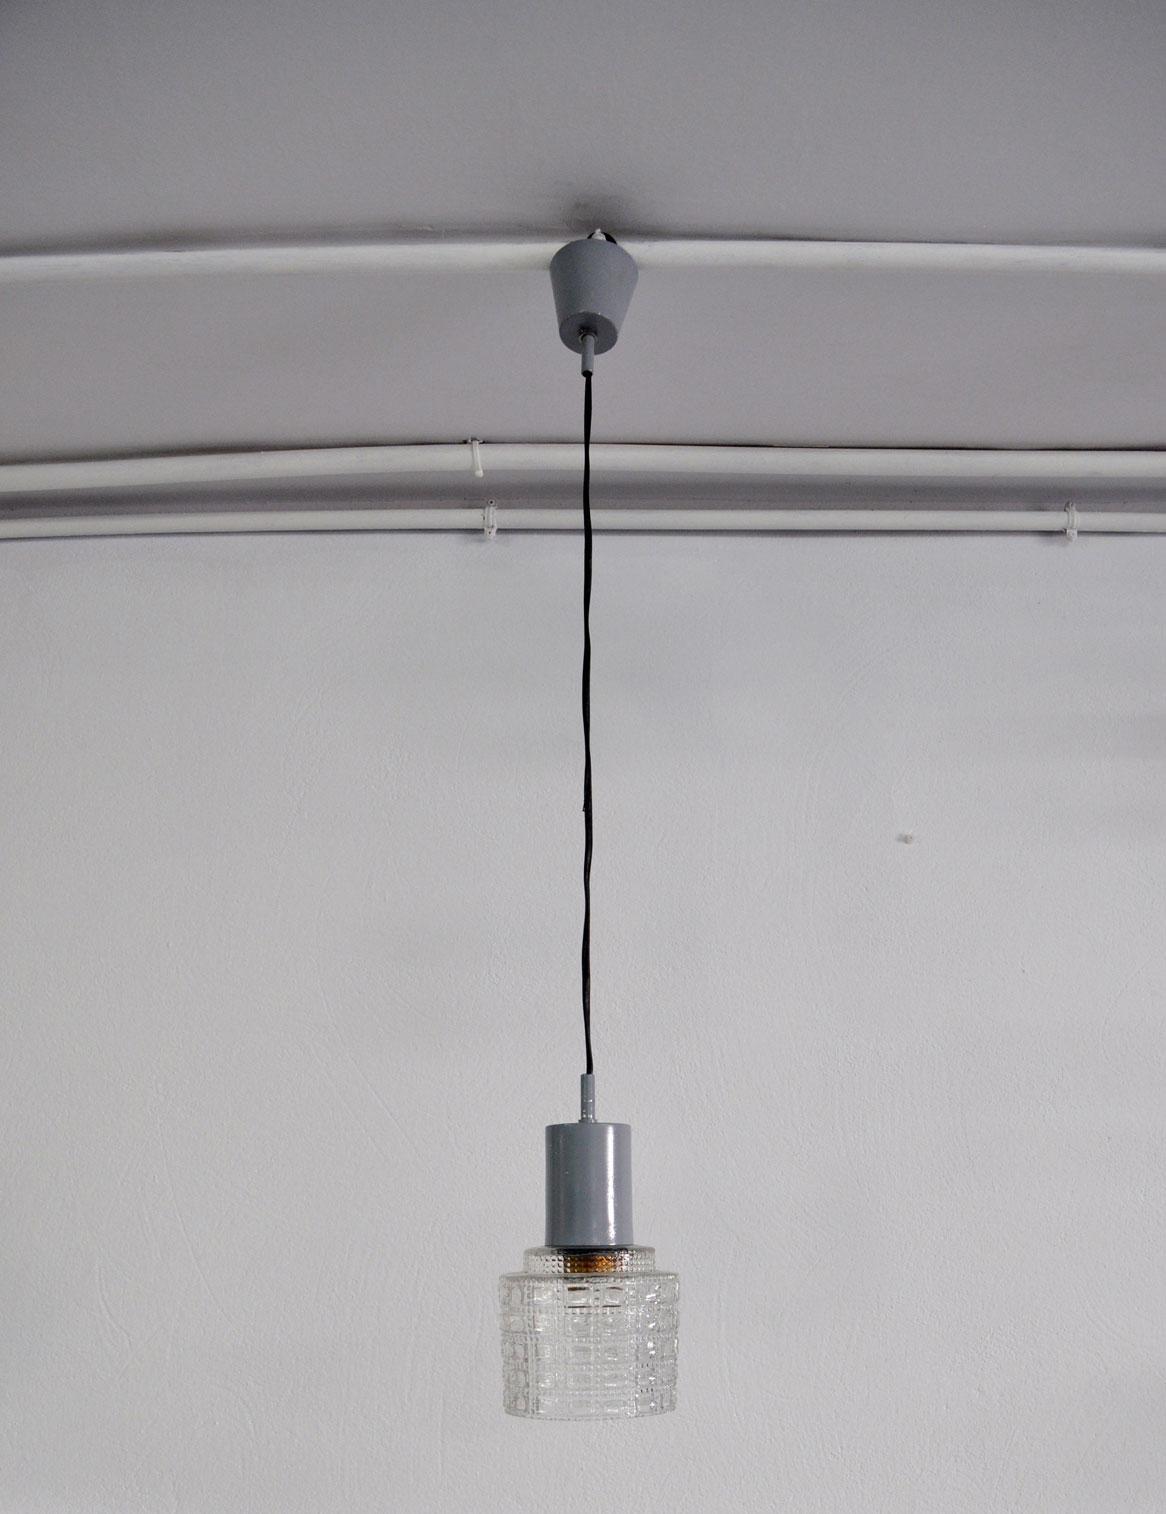 L mpara colgante de vidrio polonium 209 - Colgantes de cristal para lamparas ...